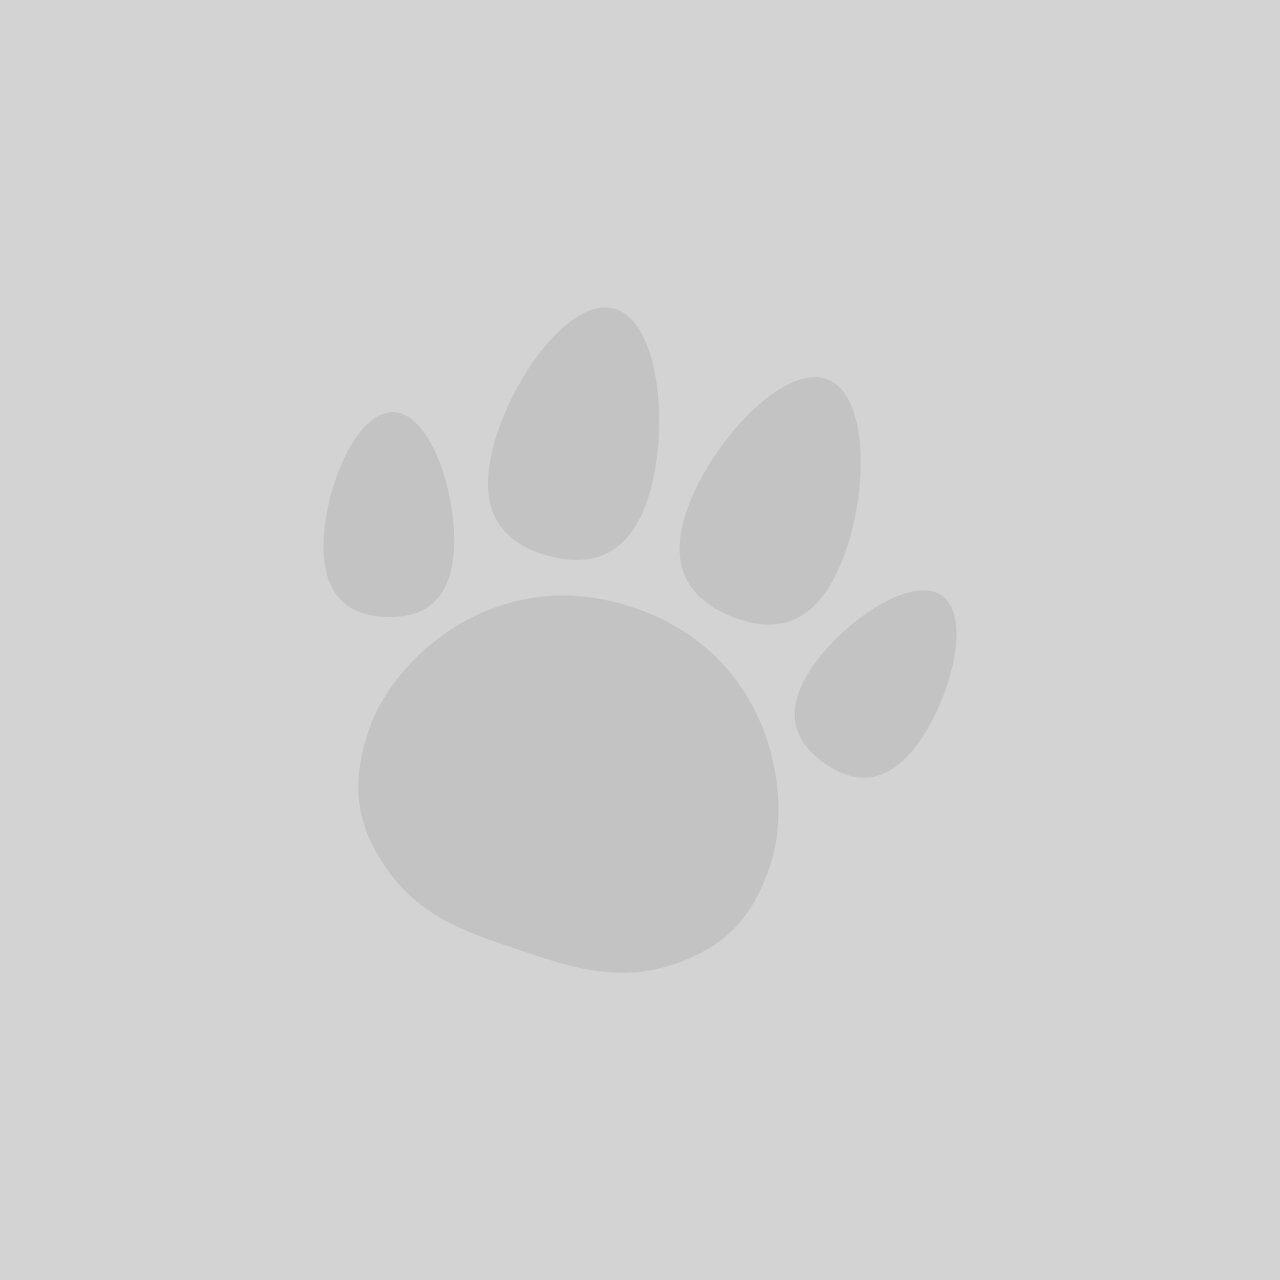 Reflective Dog Coat (Size Options Available)